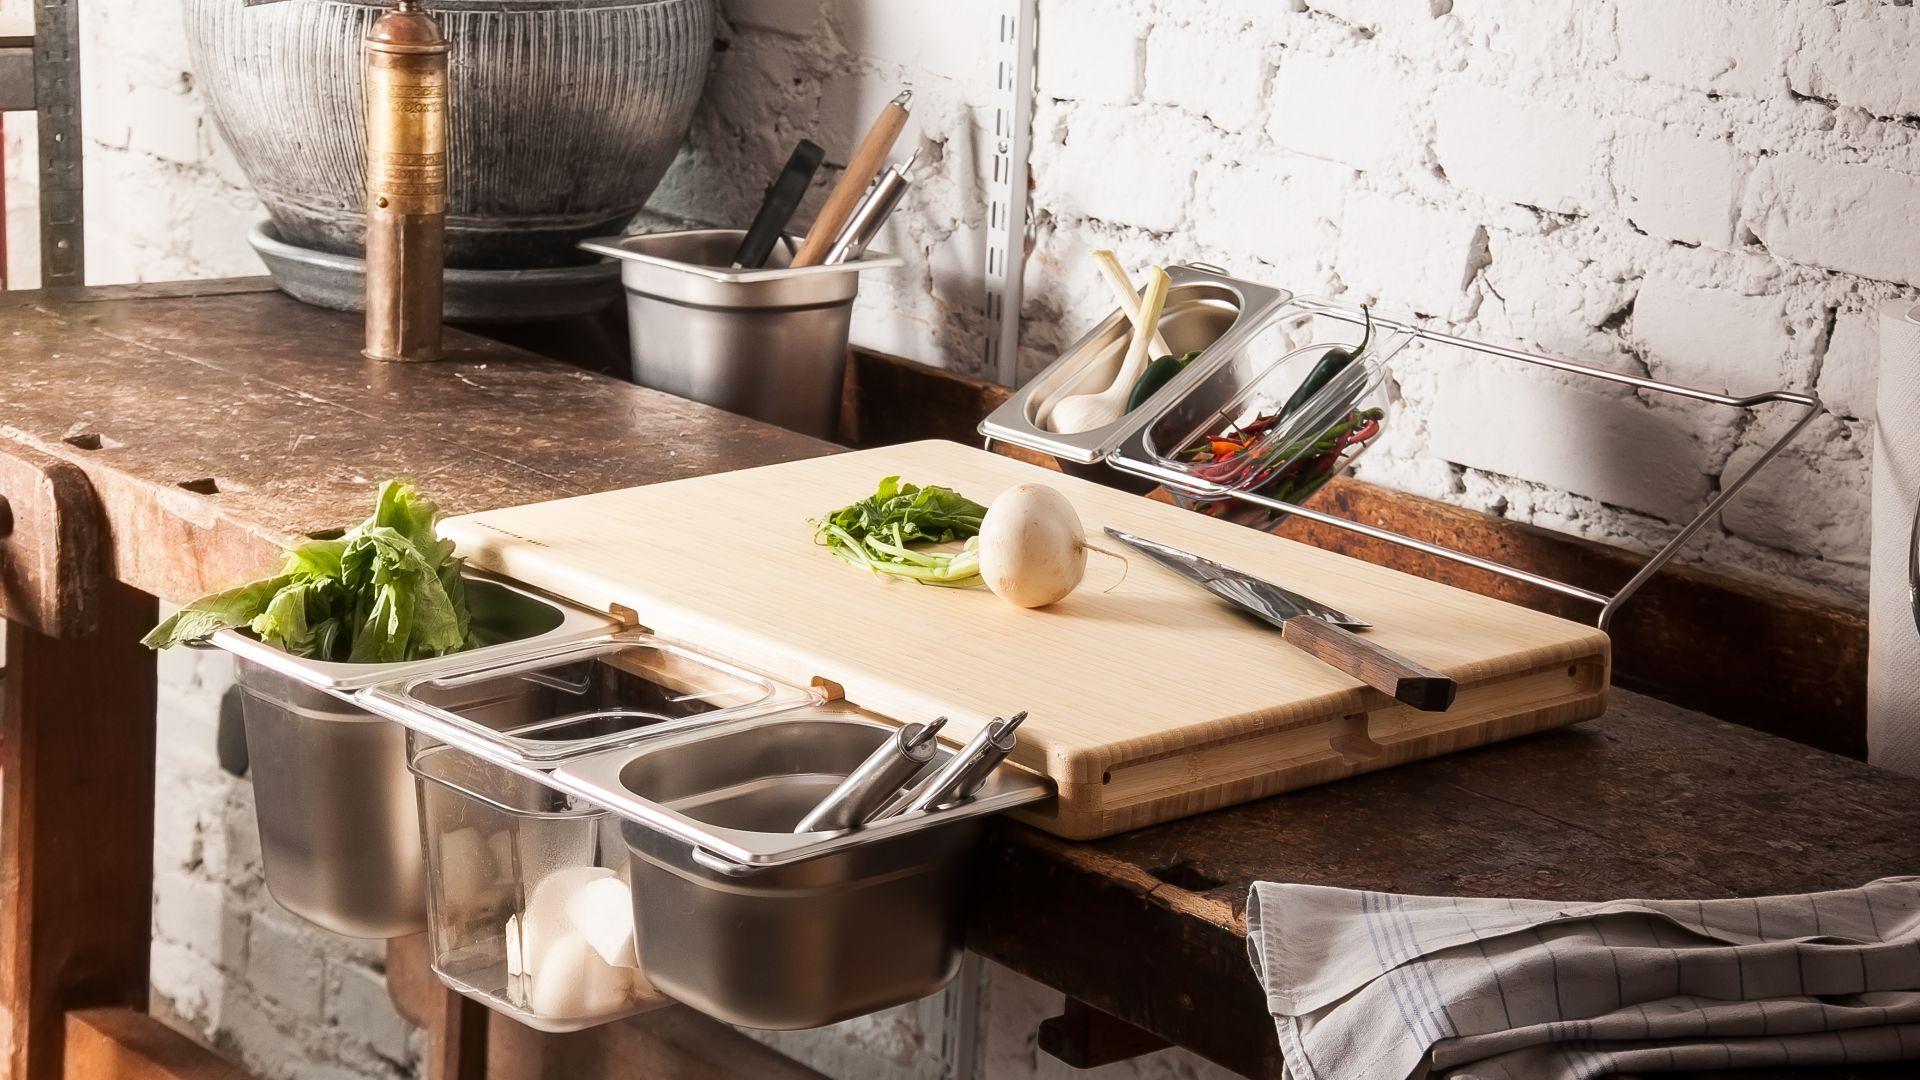 Frankfurter Brett :: The kitchen workbench - Frankfurter Brett ...